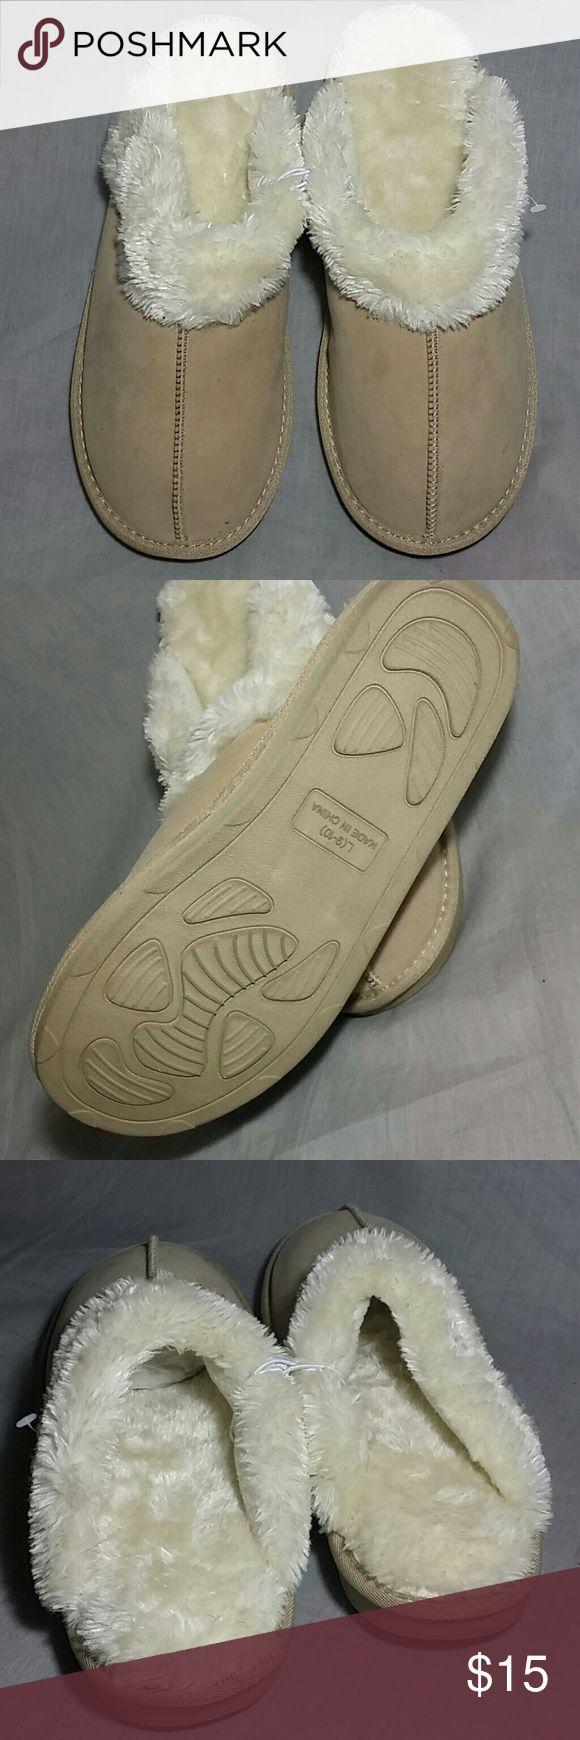 Women's Clogs Shoes Beige 10 M NEW Item is NEW clogs Shoes Mules & Clogs